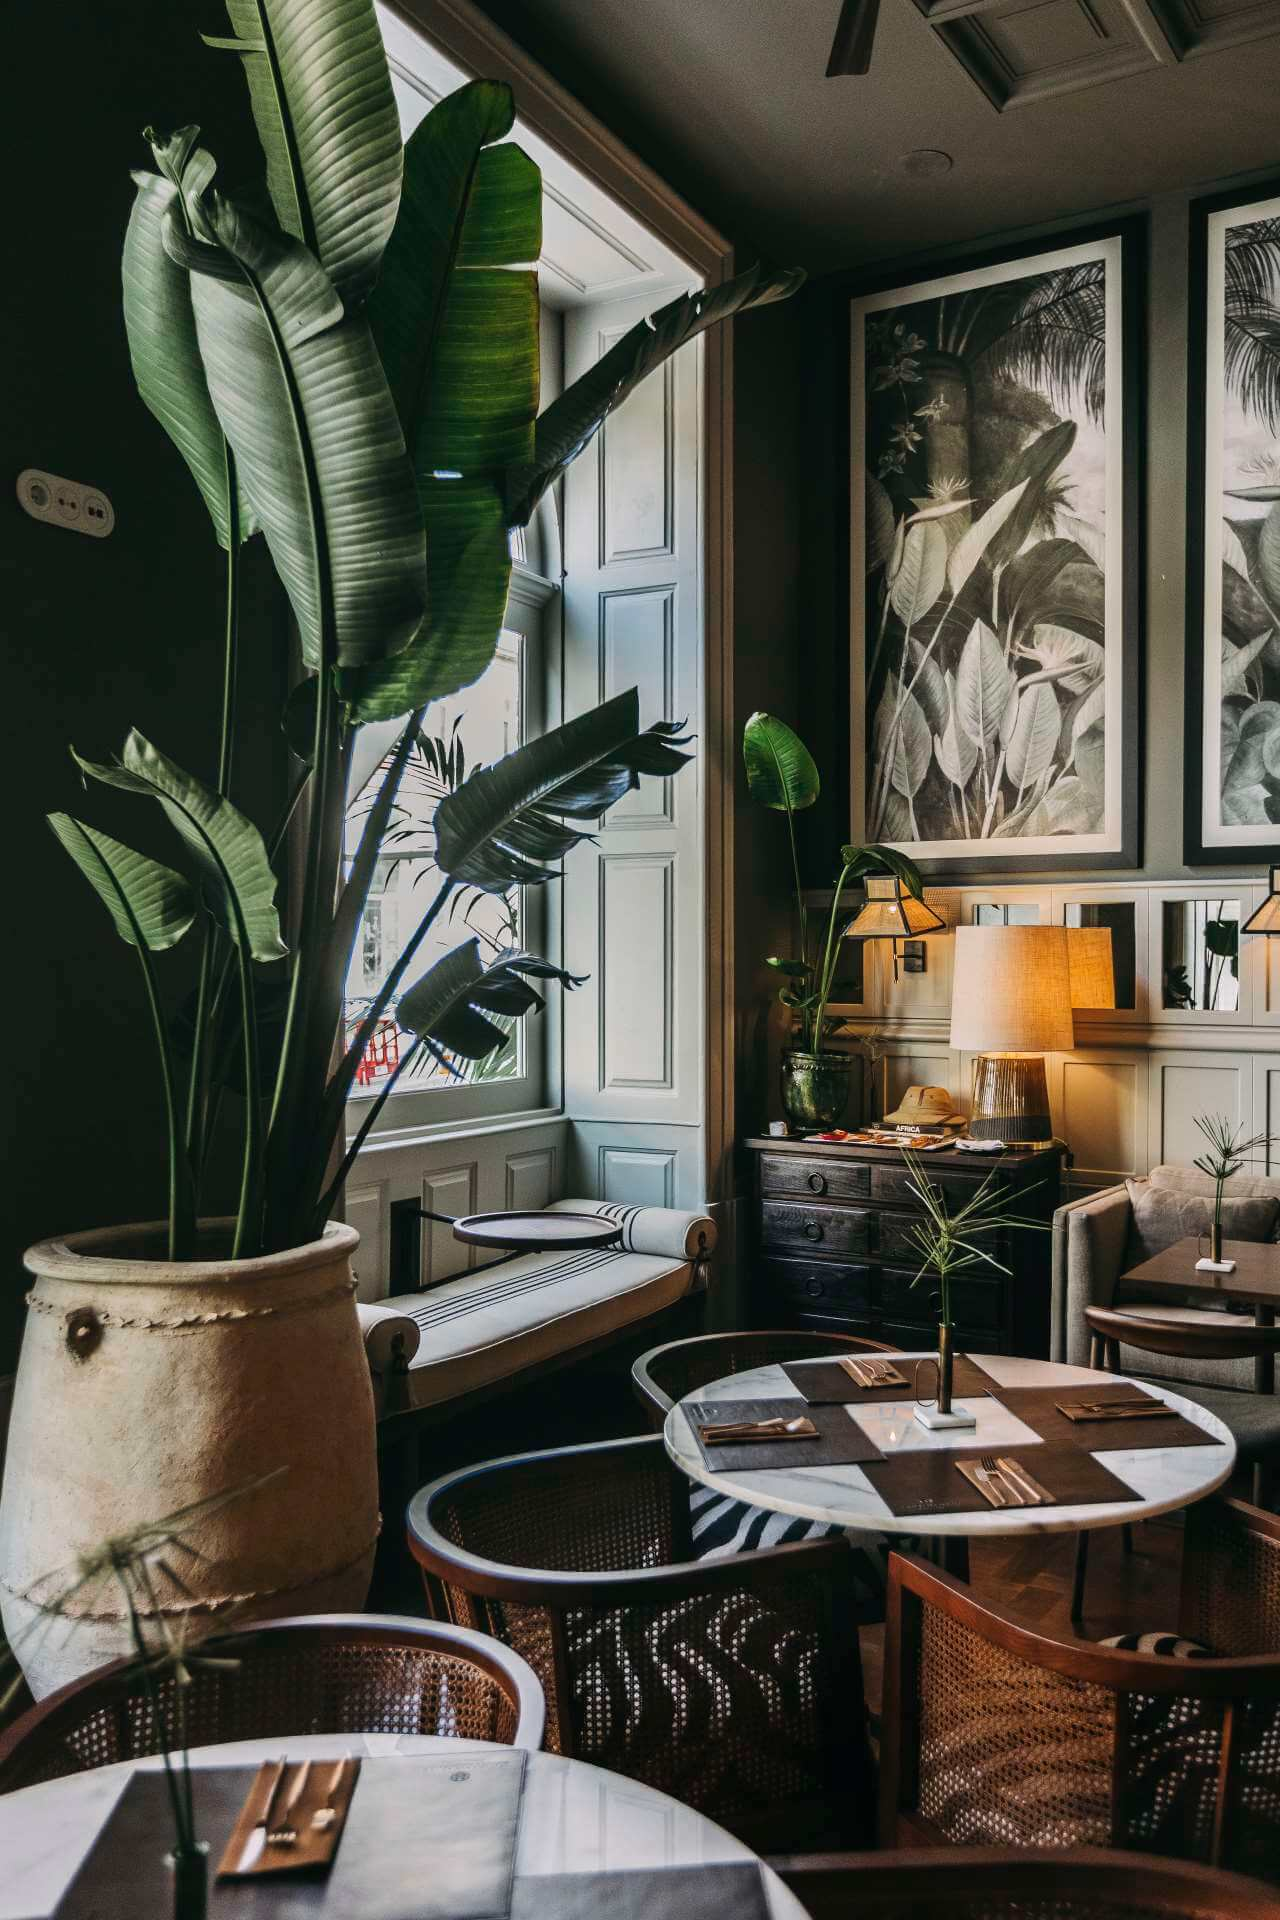 Torel 1884: A Luxurious Boutique Hotel in Porto